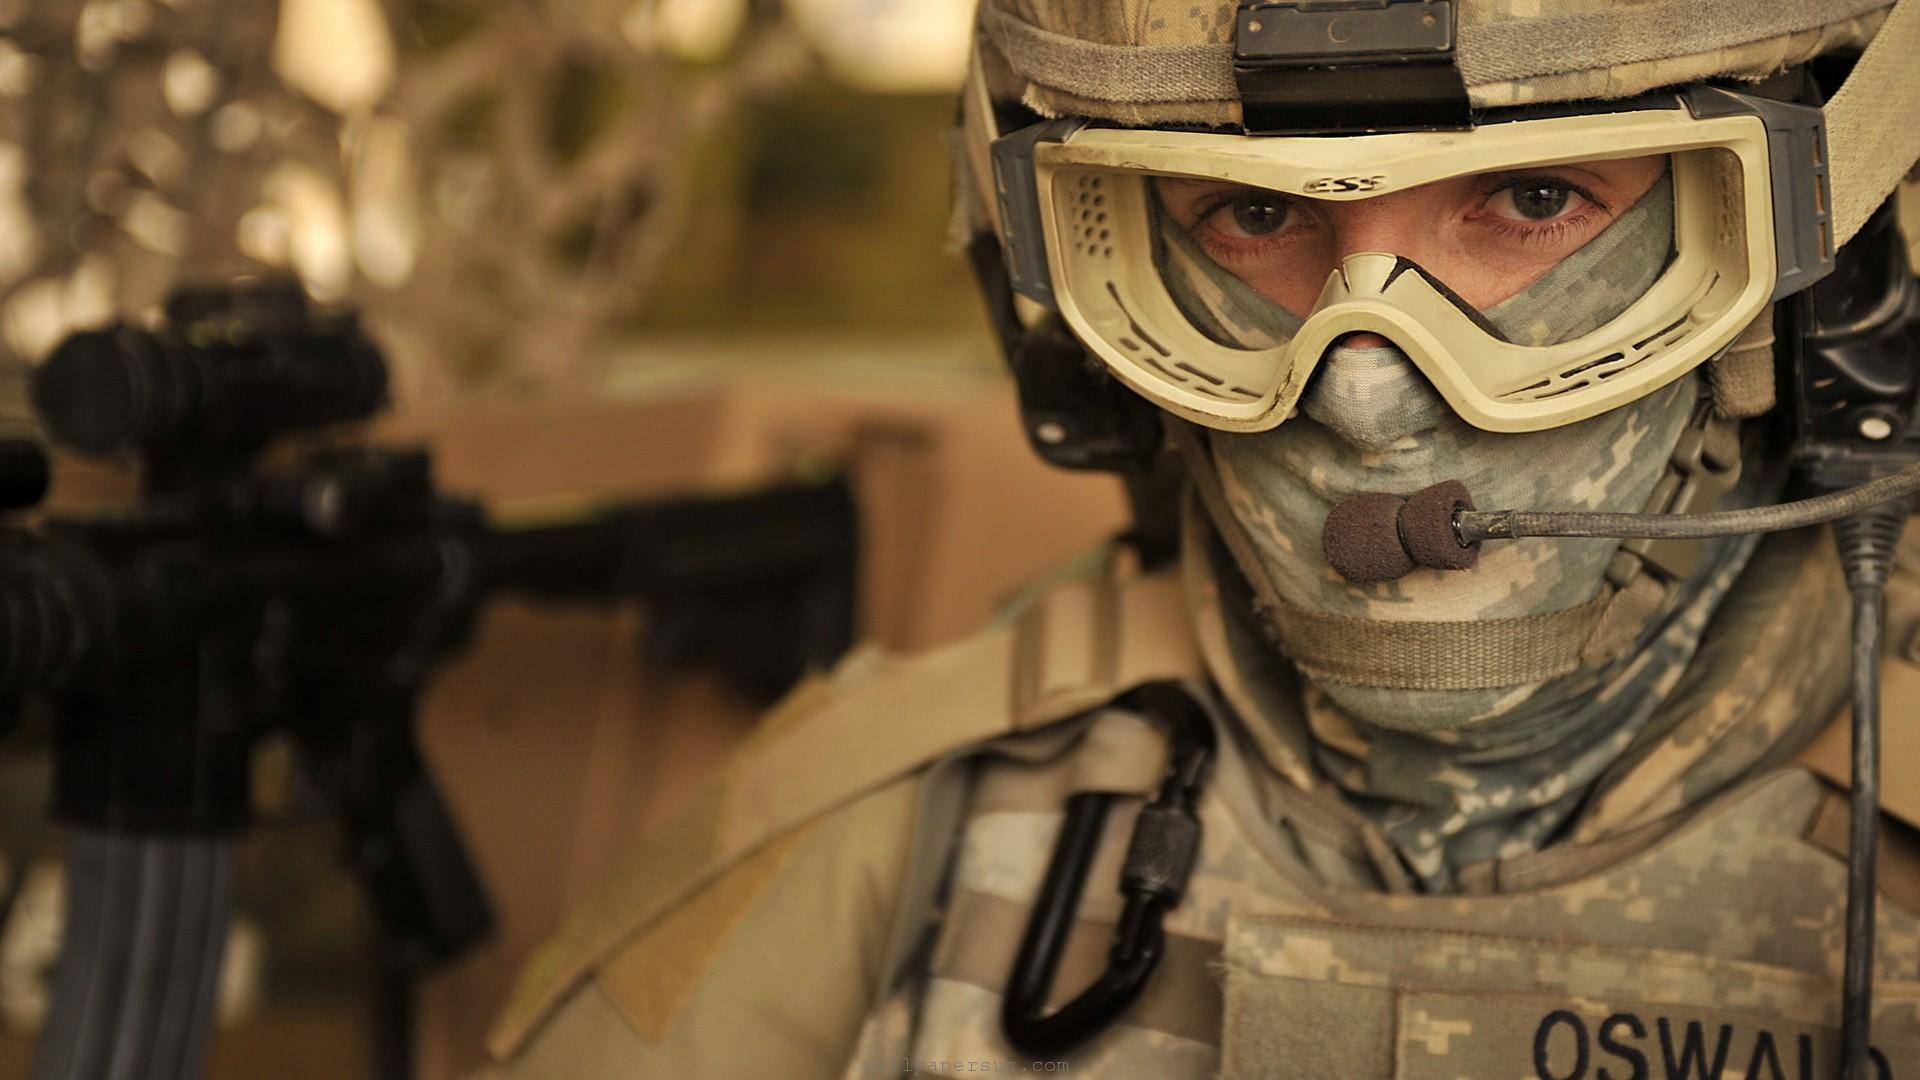 Explore Army Wallpaper, Hd Wallpaper, and more!